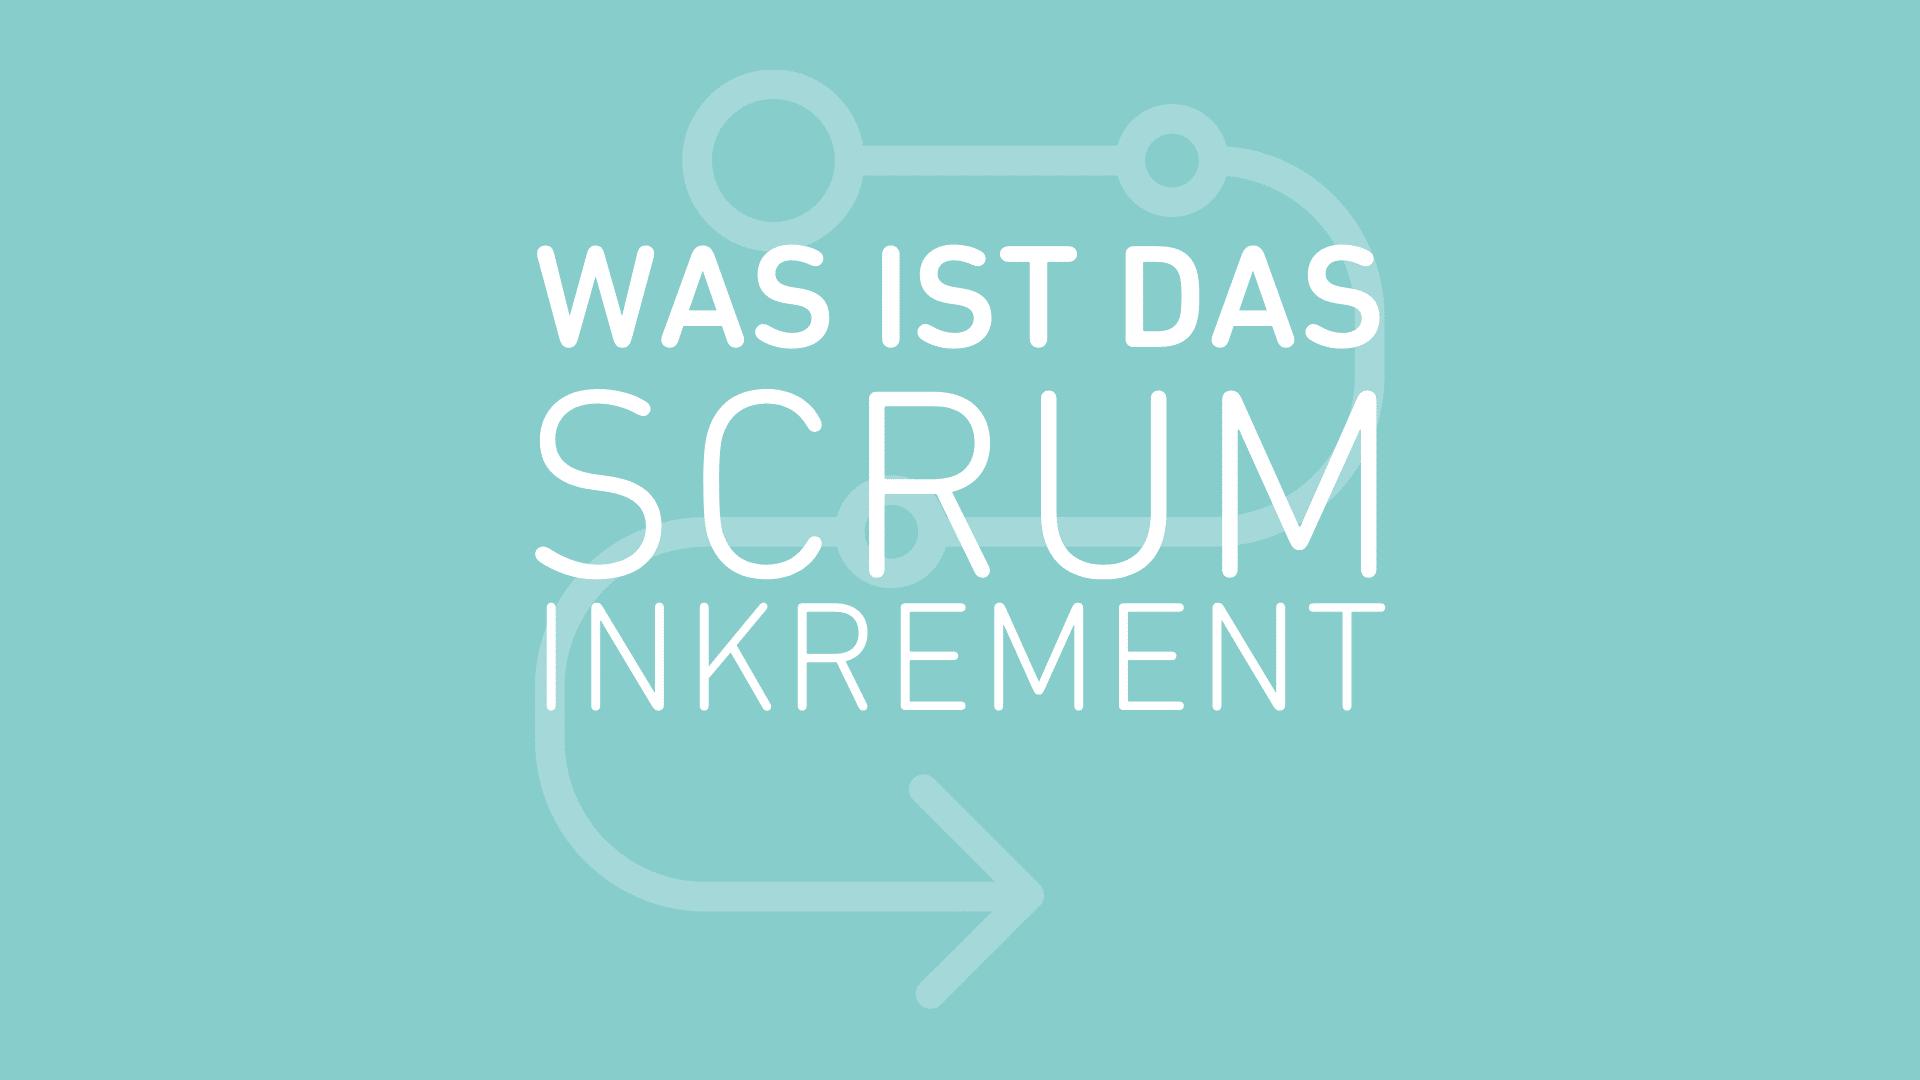 SCRUM-Inkrement